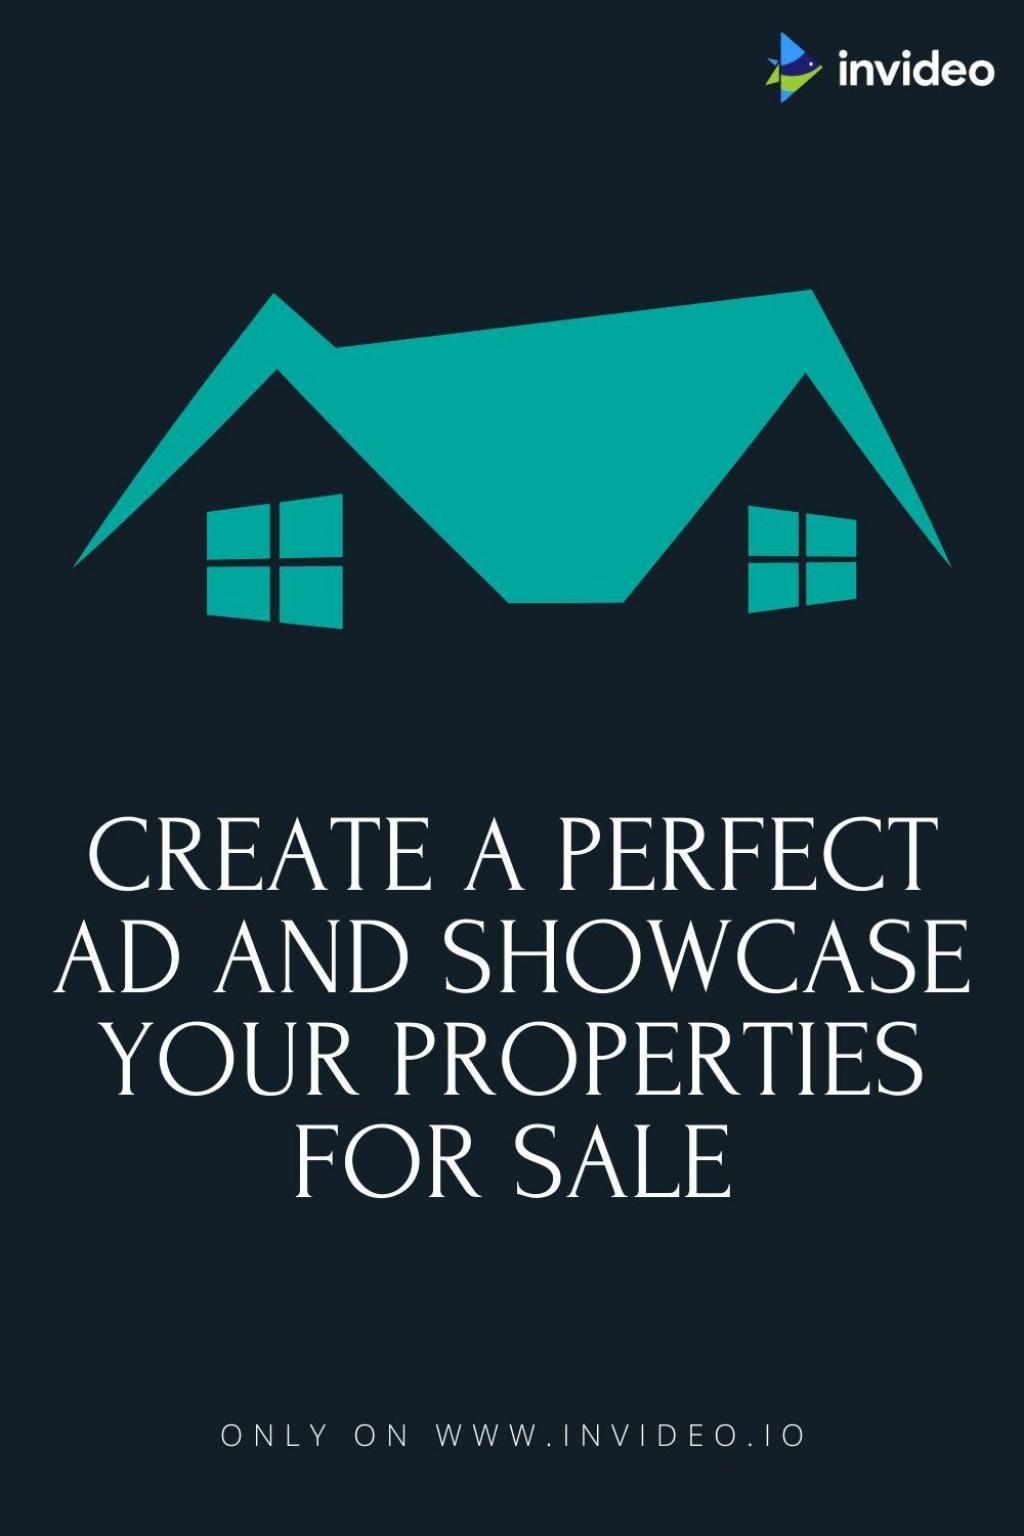 001 Unbelievable Real Estate Marketing Video Template Sample  TemplatesLarge